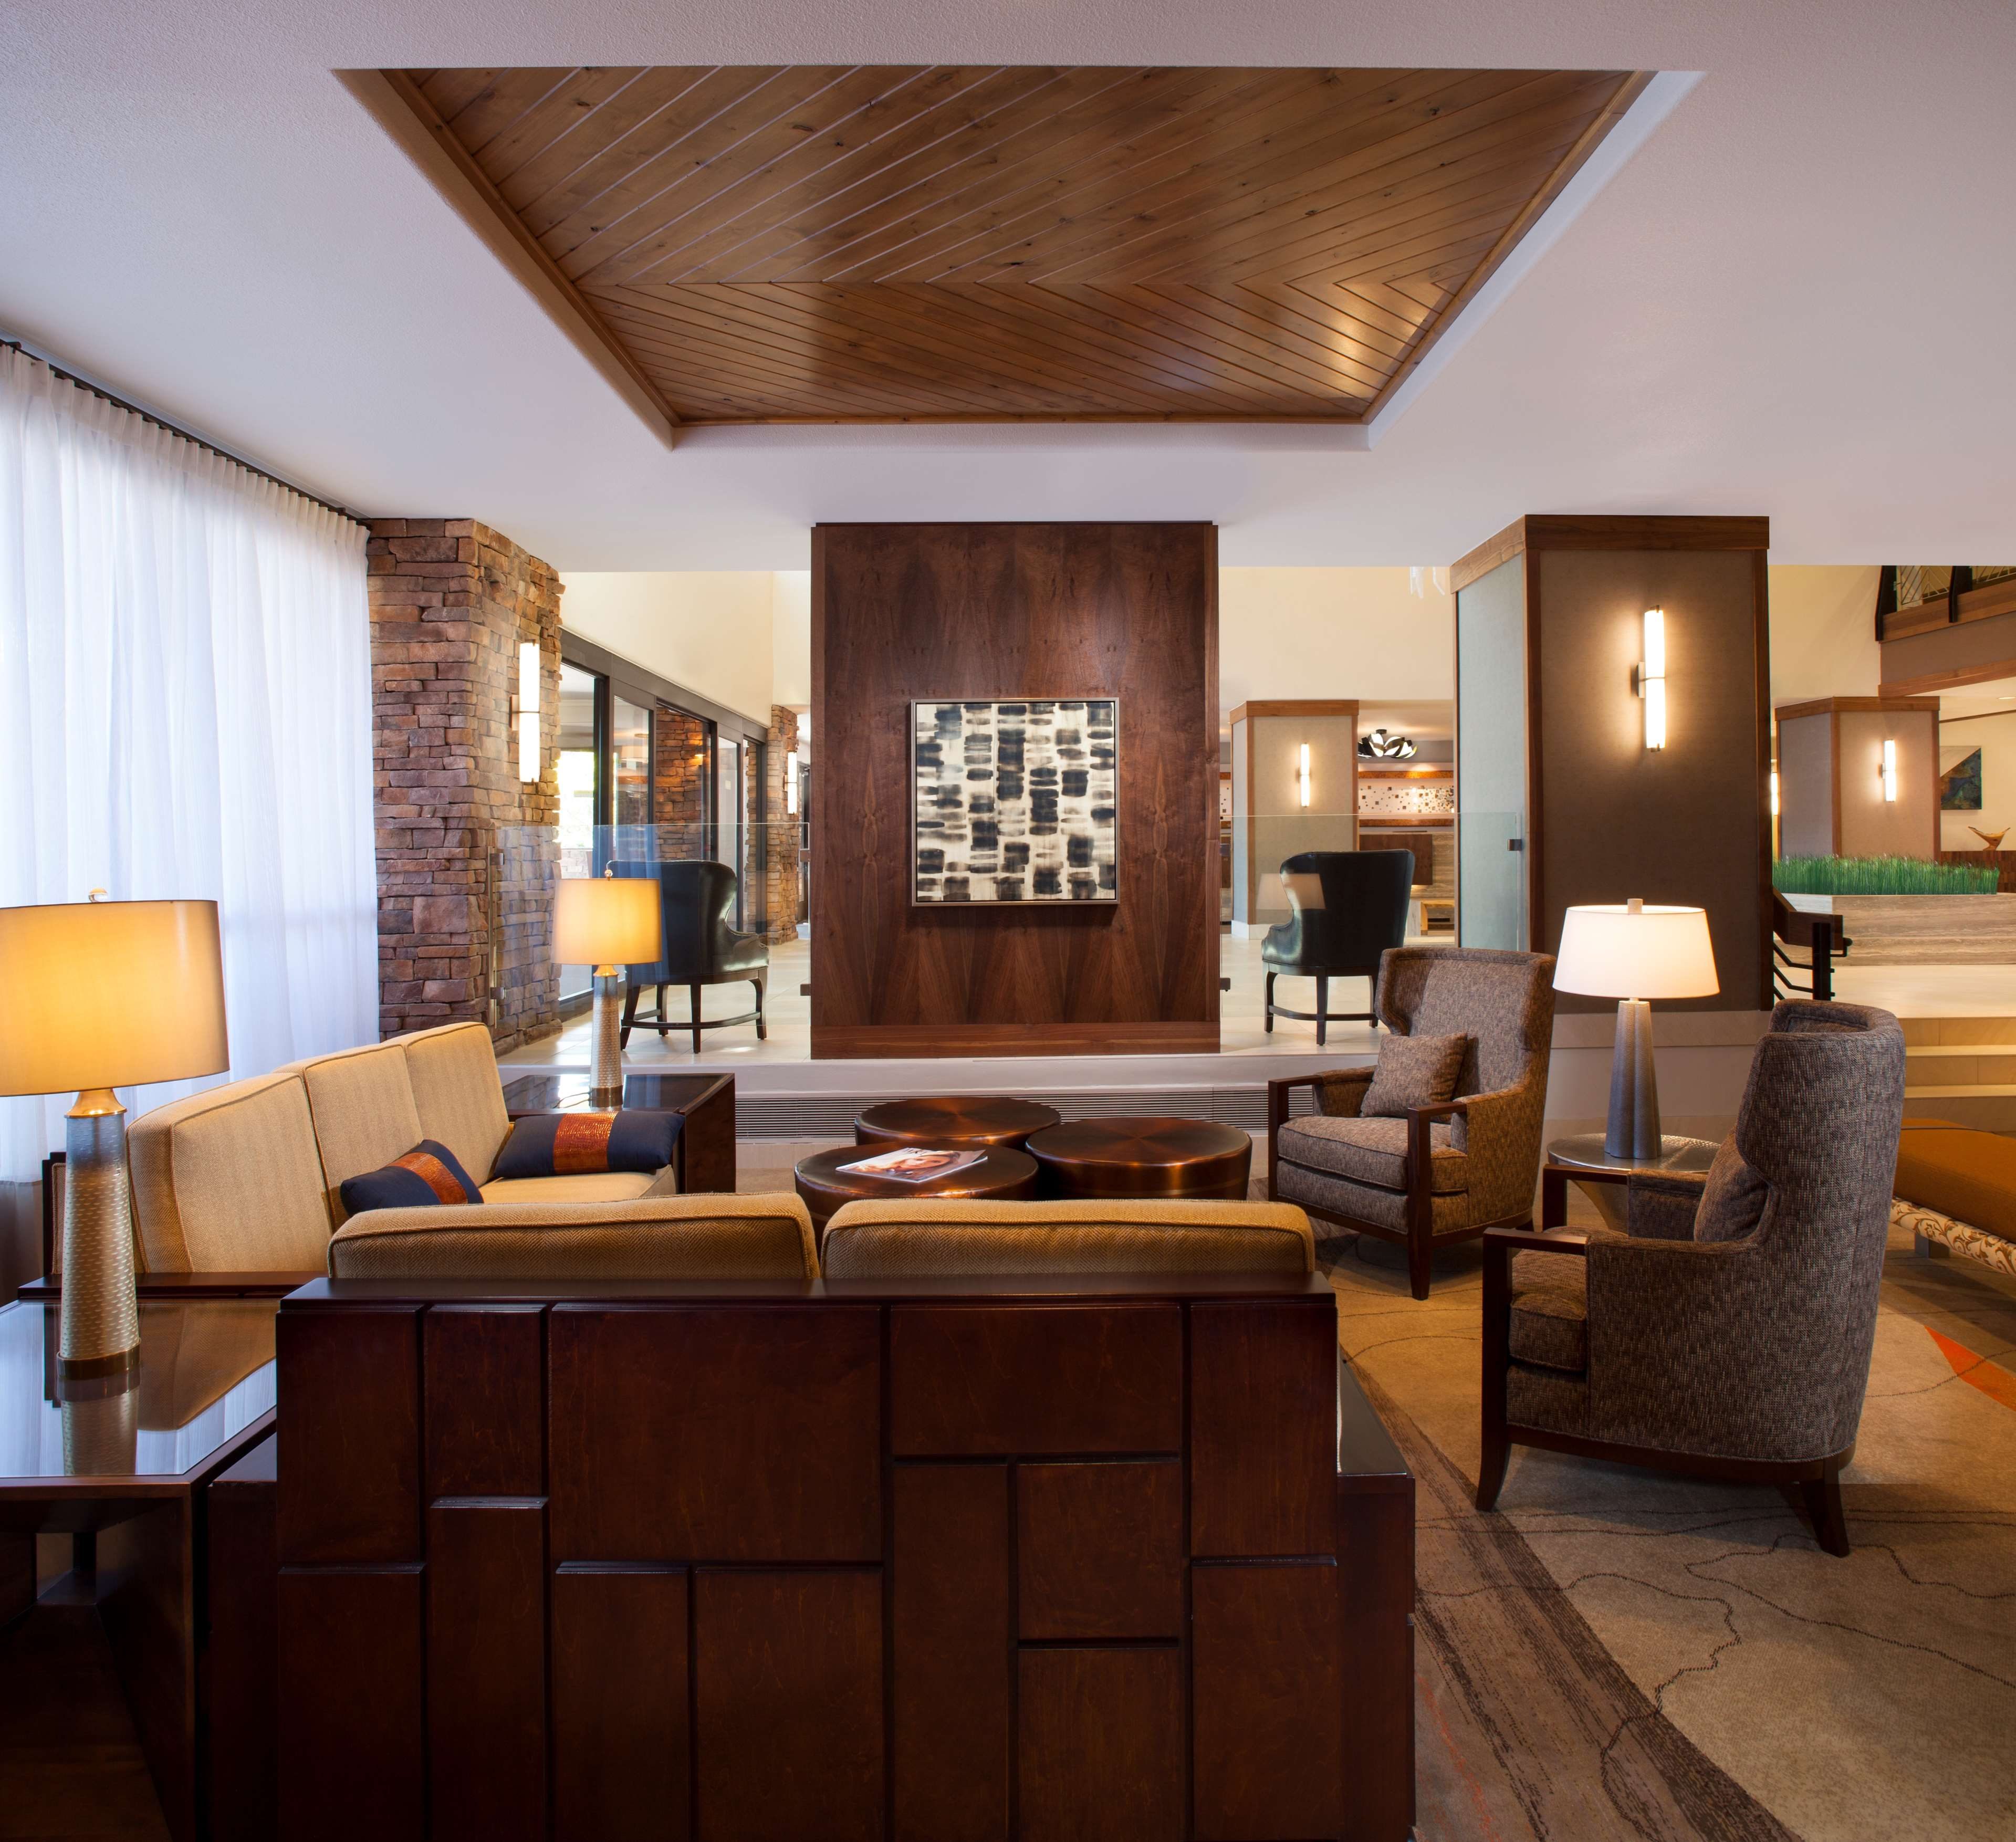 Hilton Sedona Resort at Bell Rock image 14